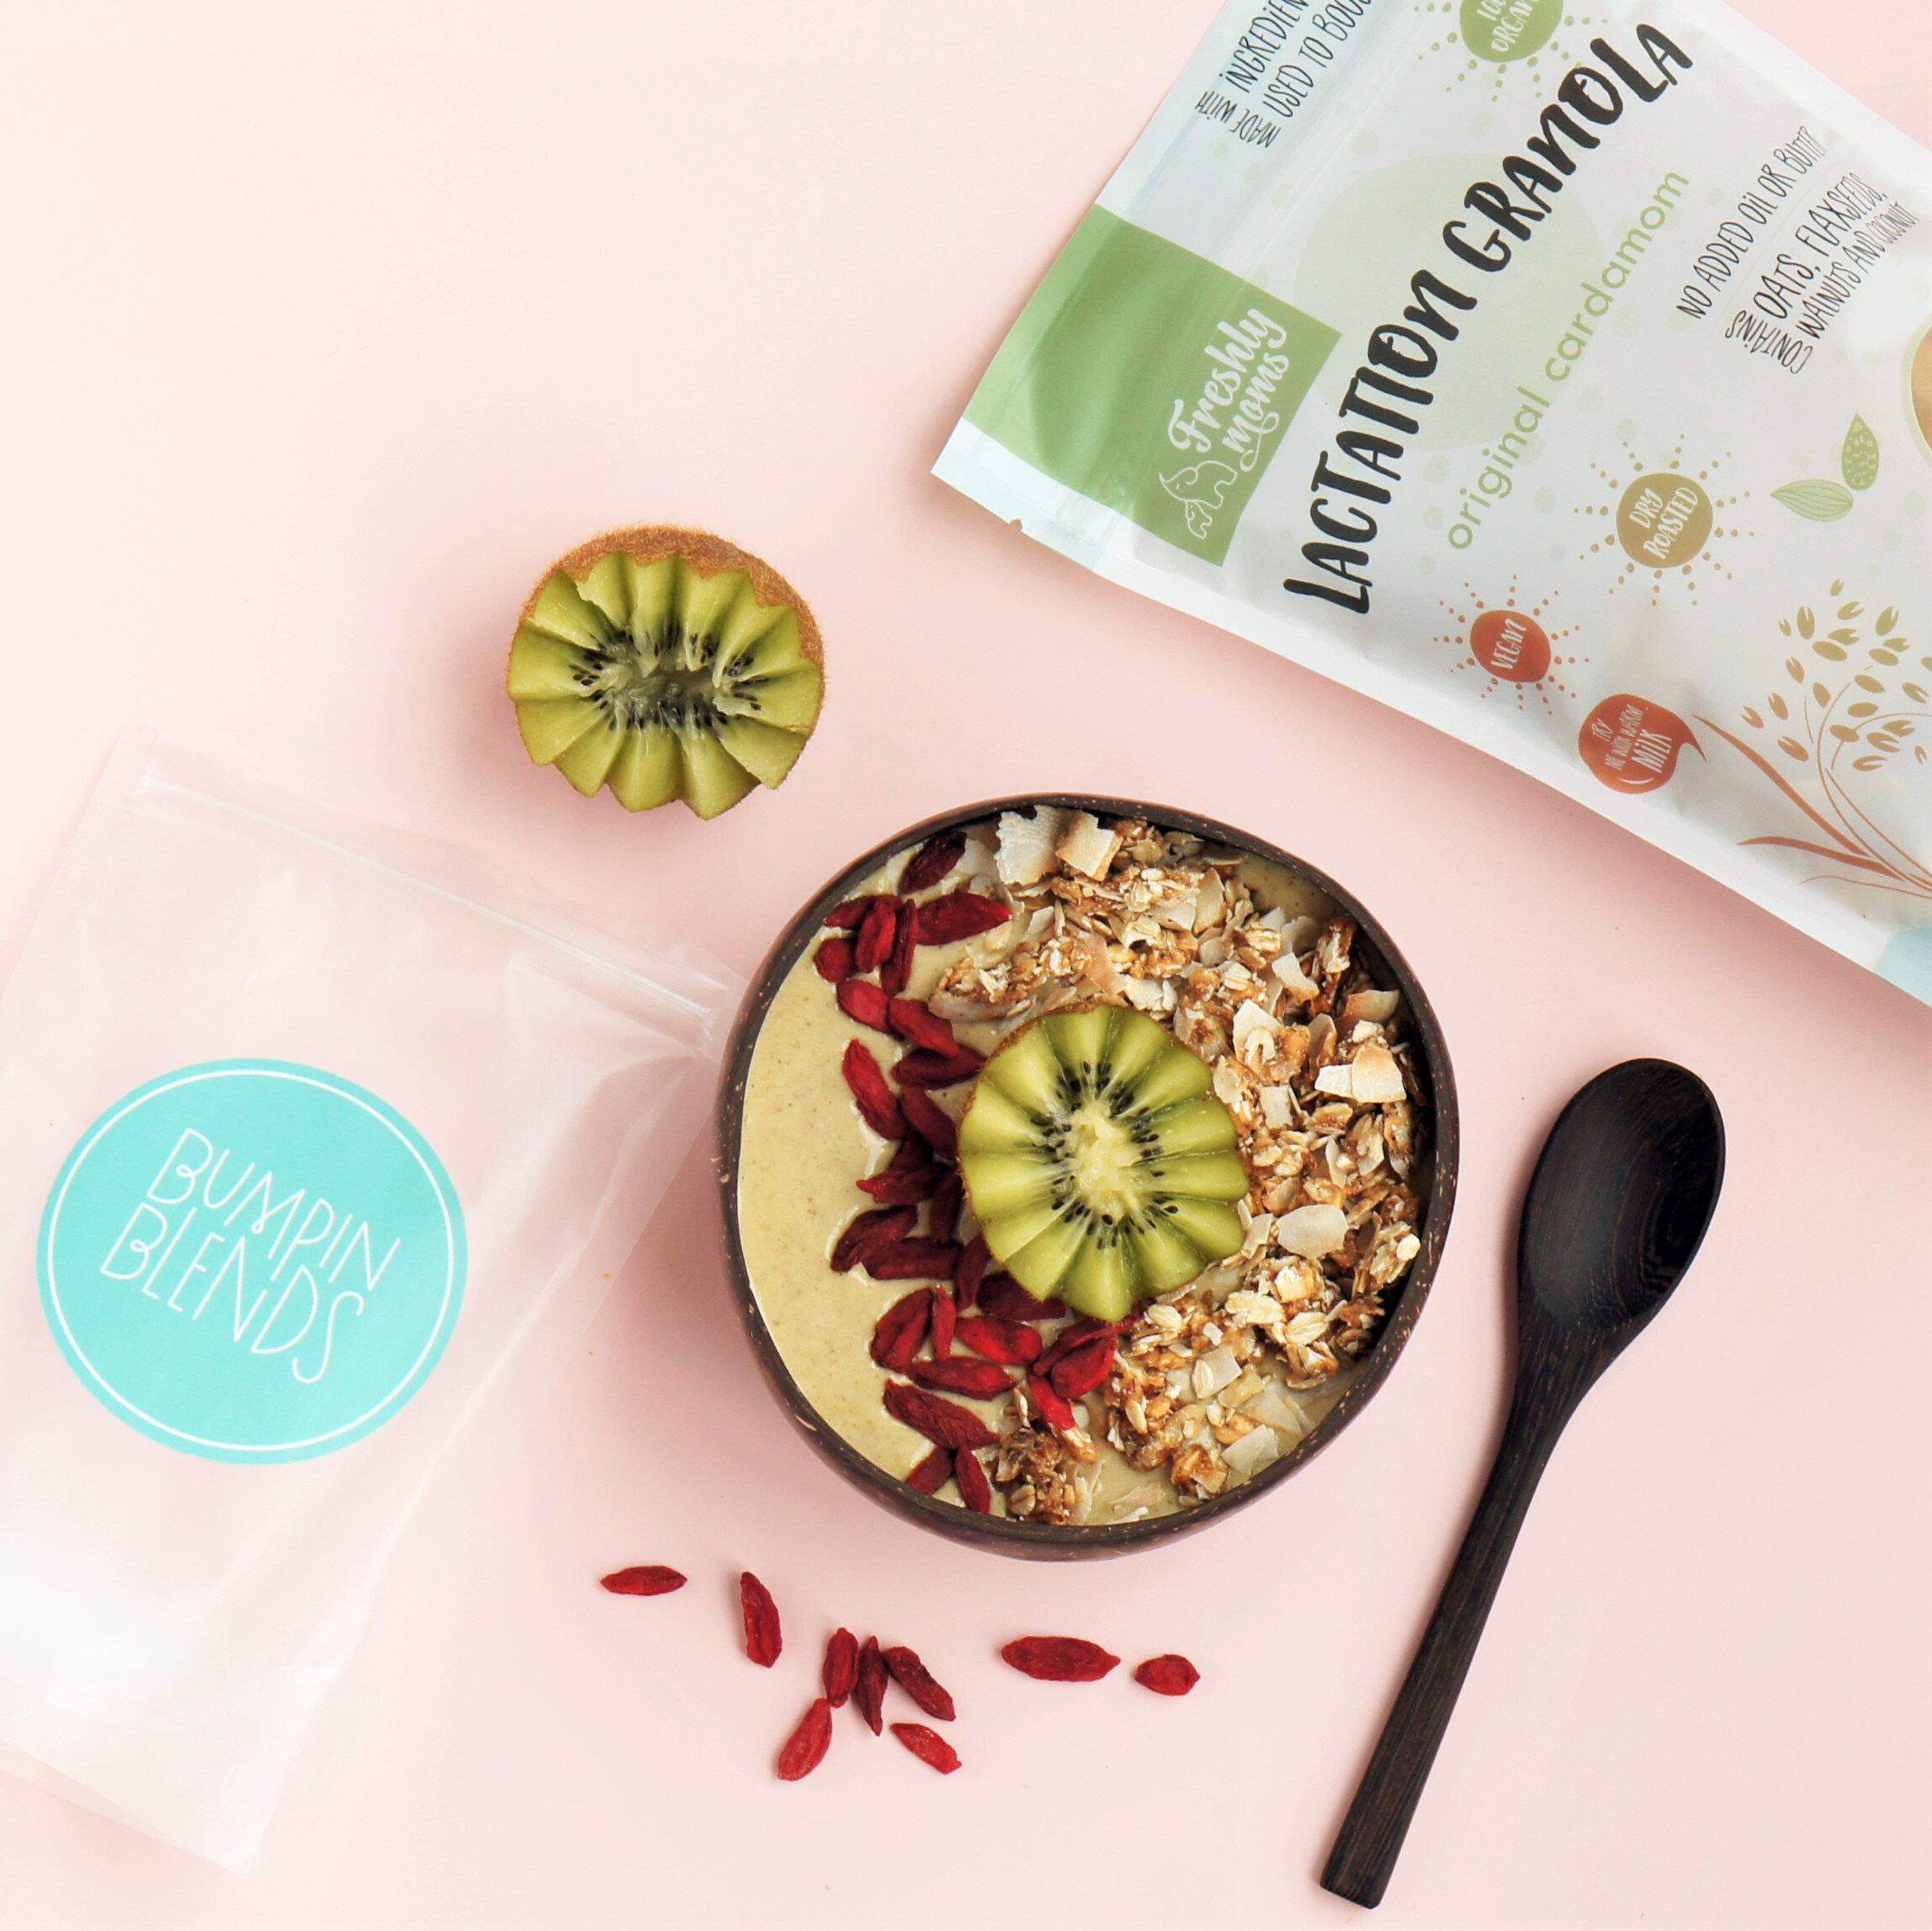 bumpin-blends-smoothie-bowl-postpartum